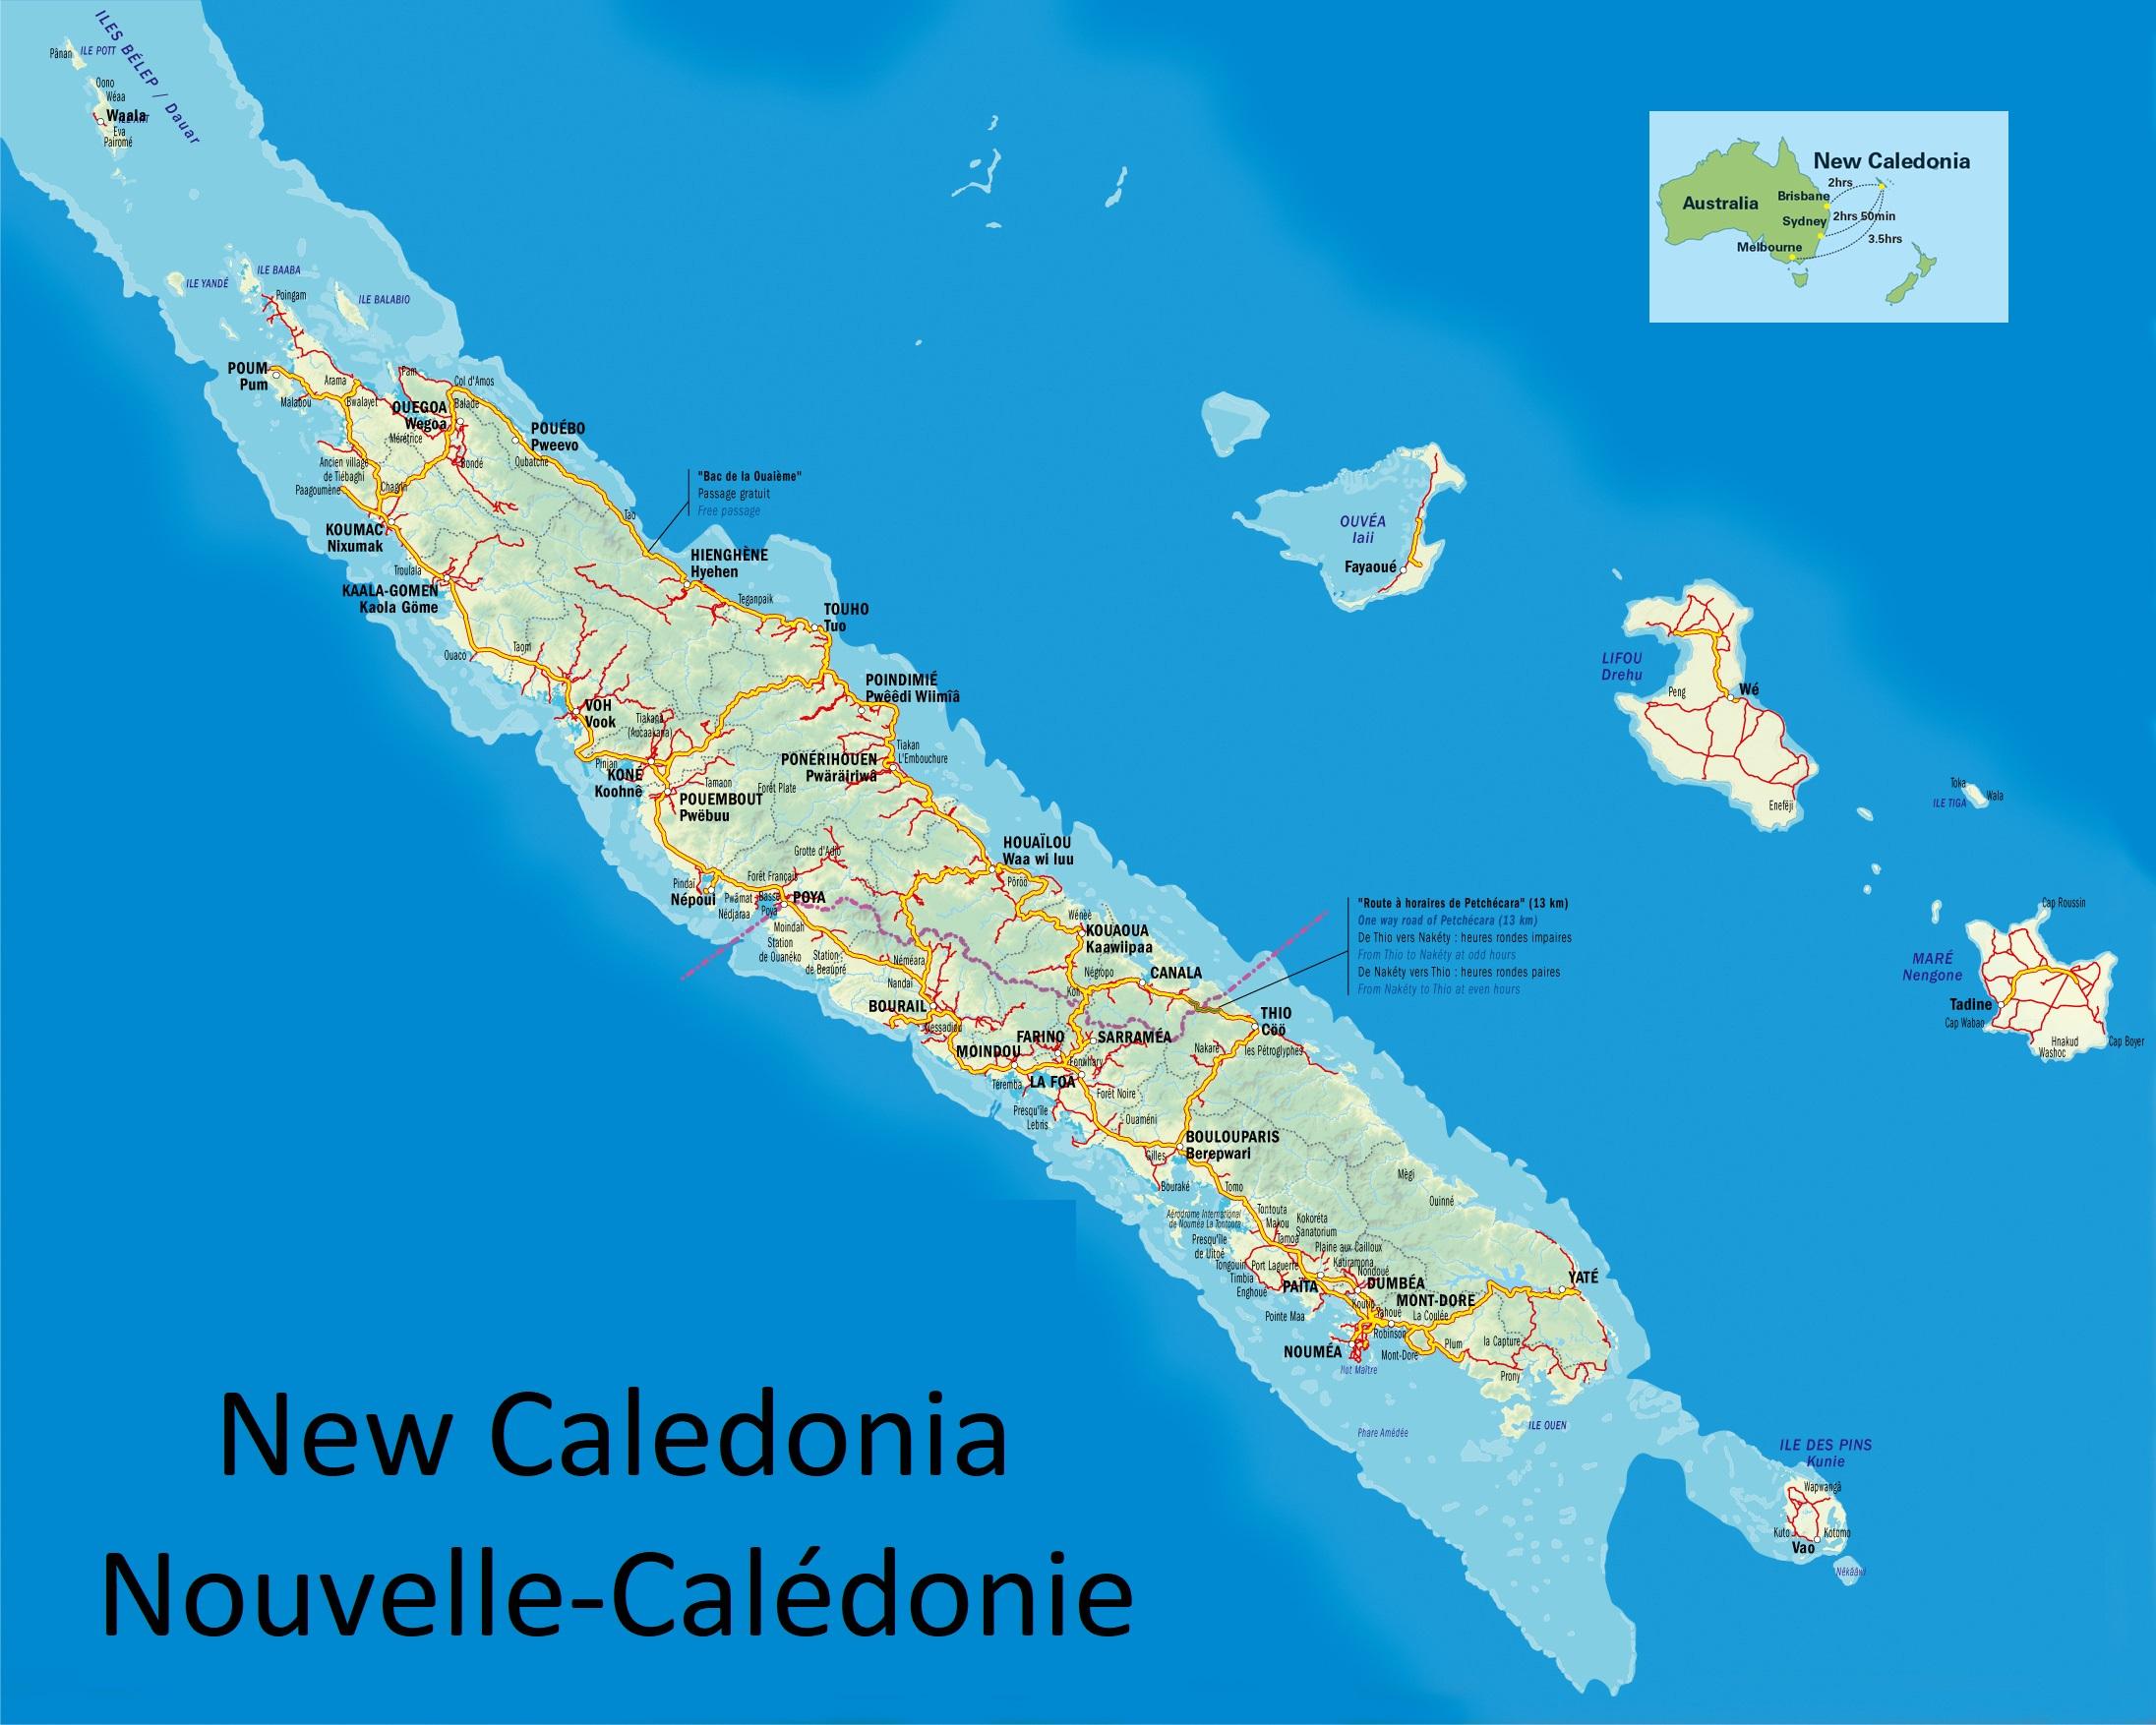 Dating new caledonia